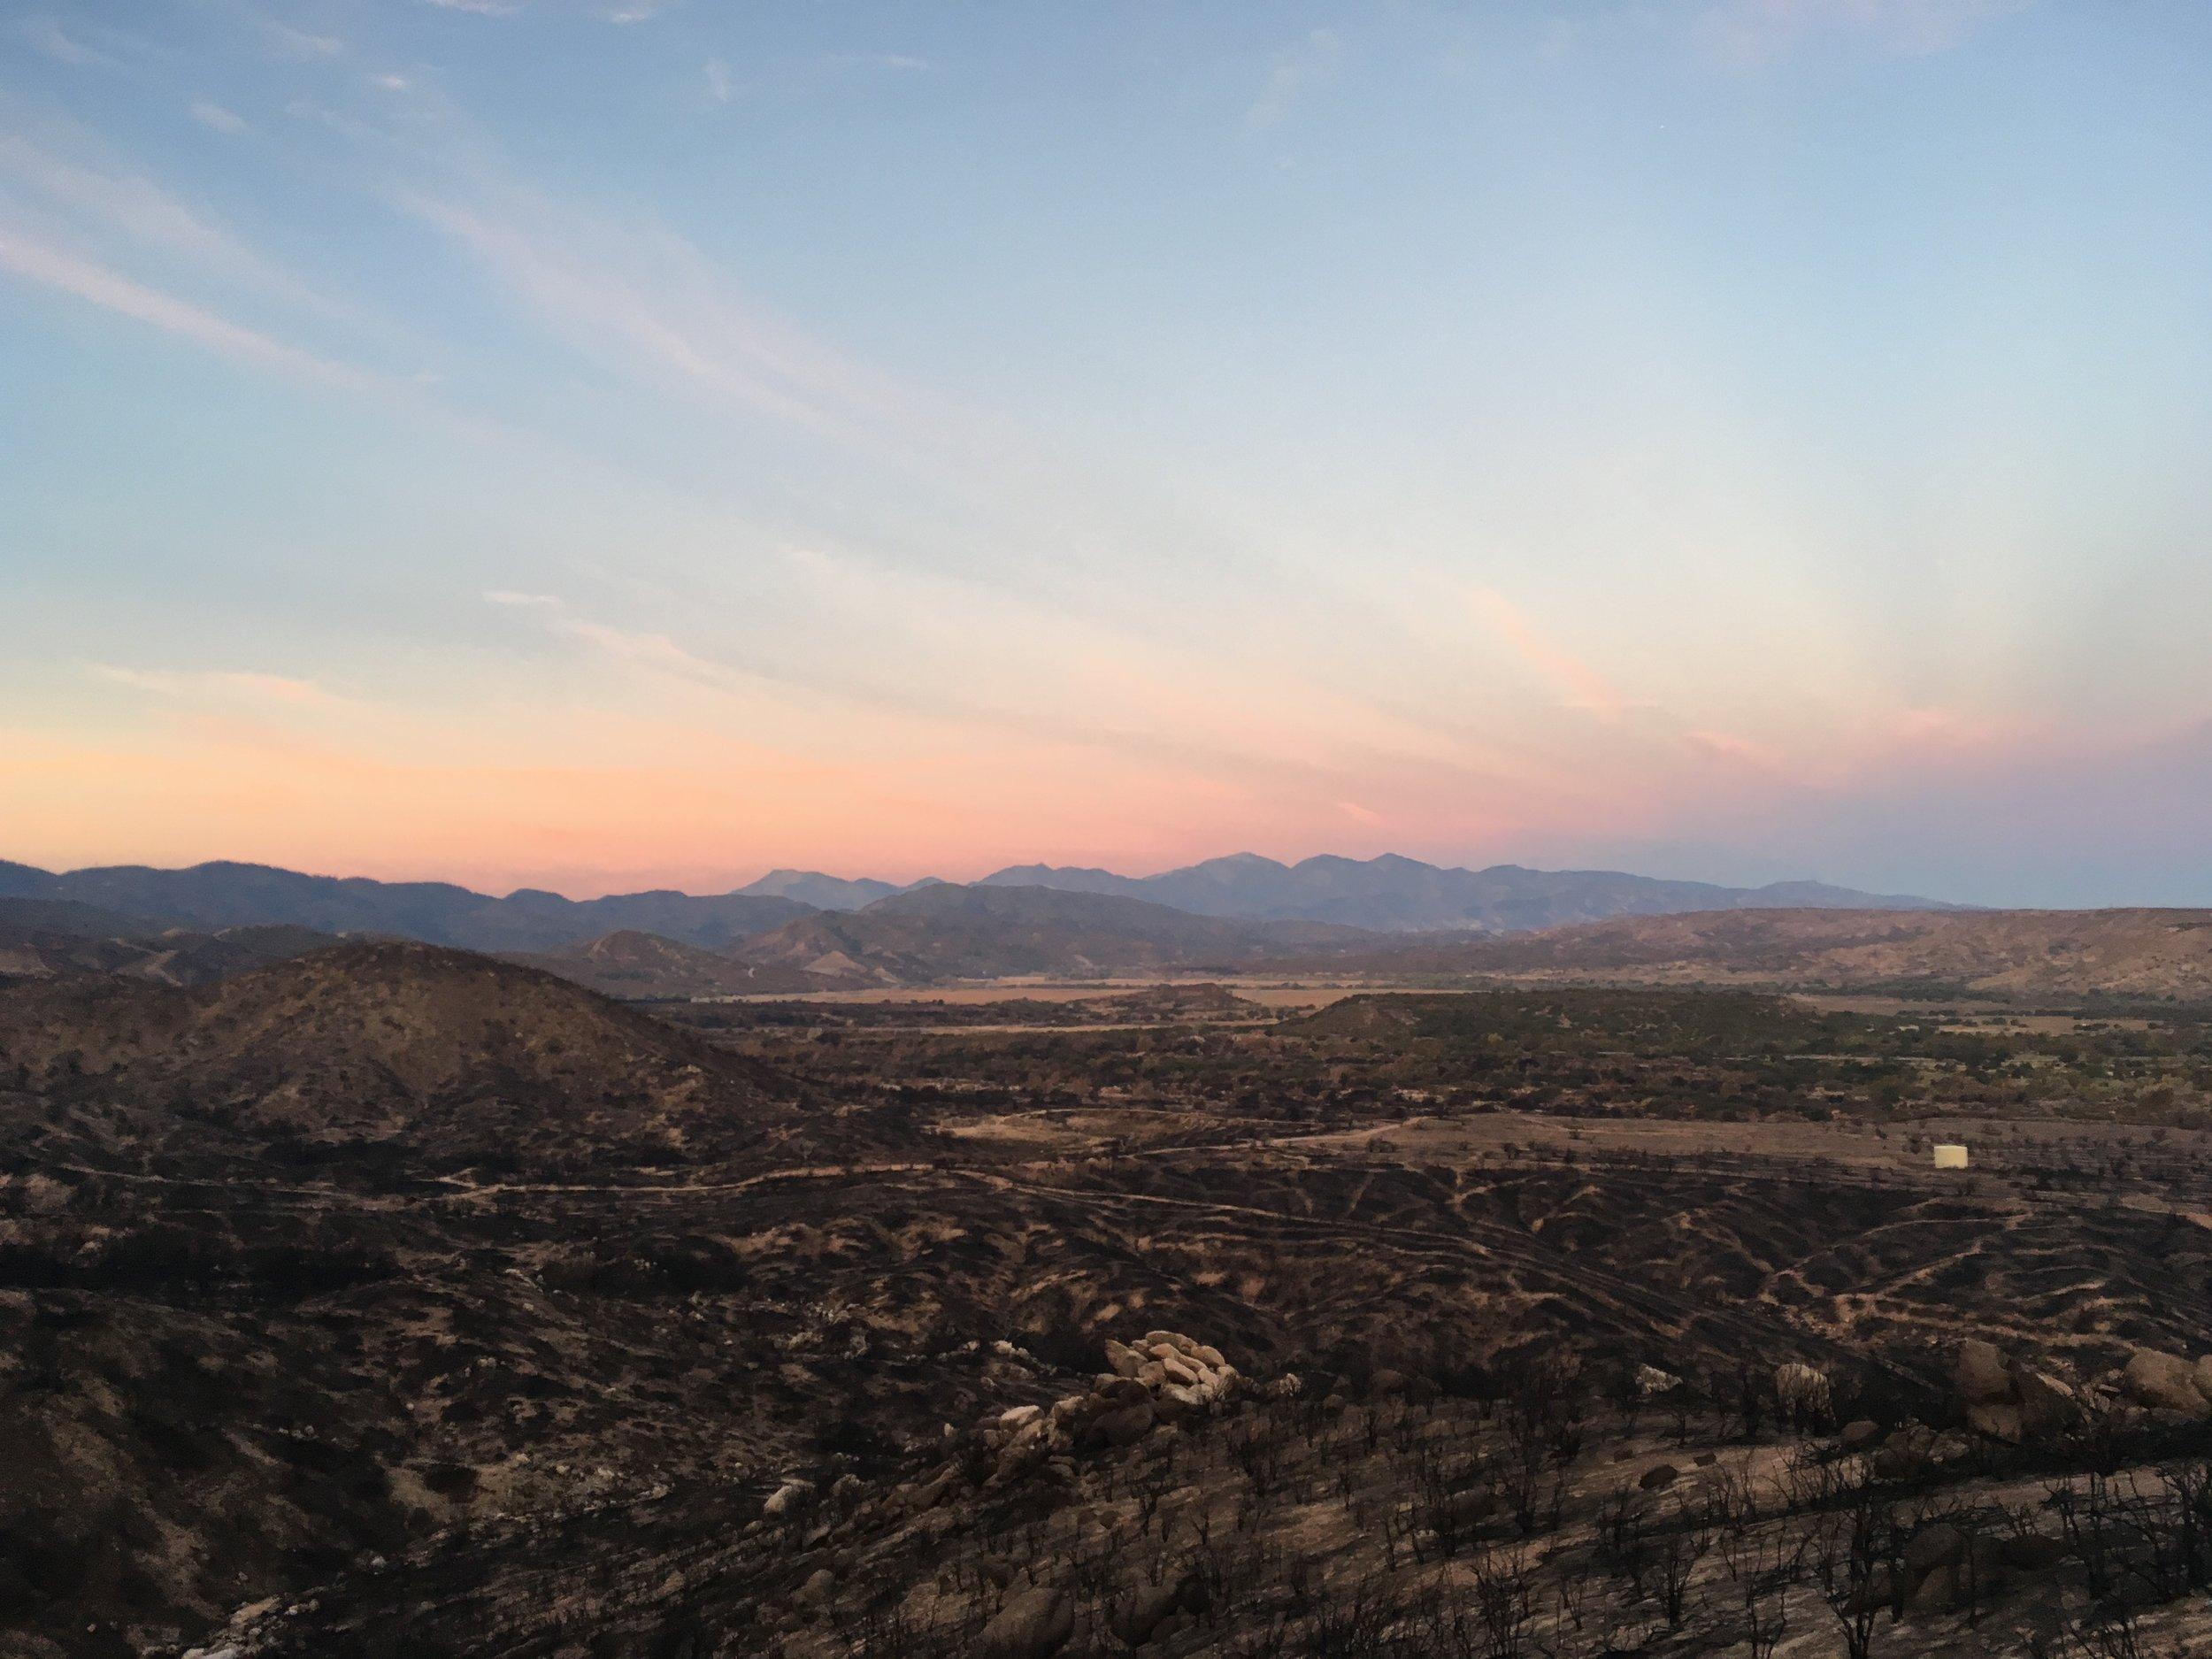 Dawn looking back to the San Gabriels from the San Bernardinos.